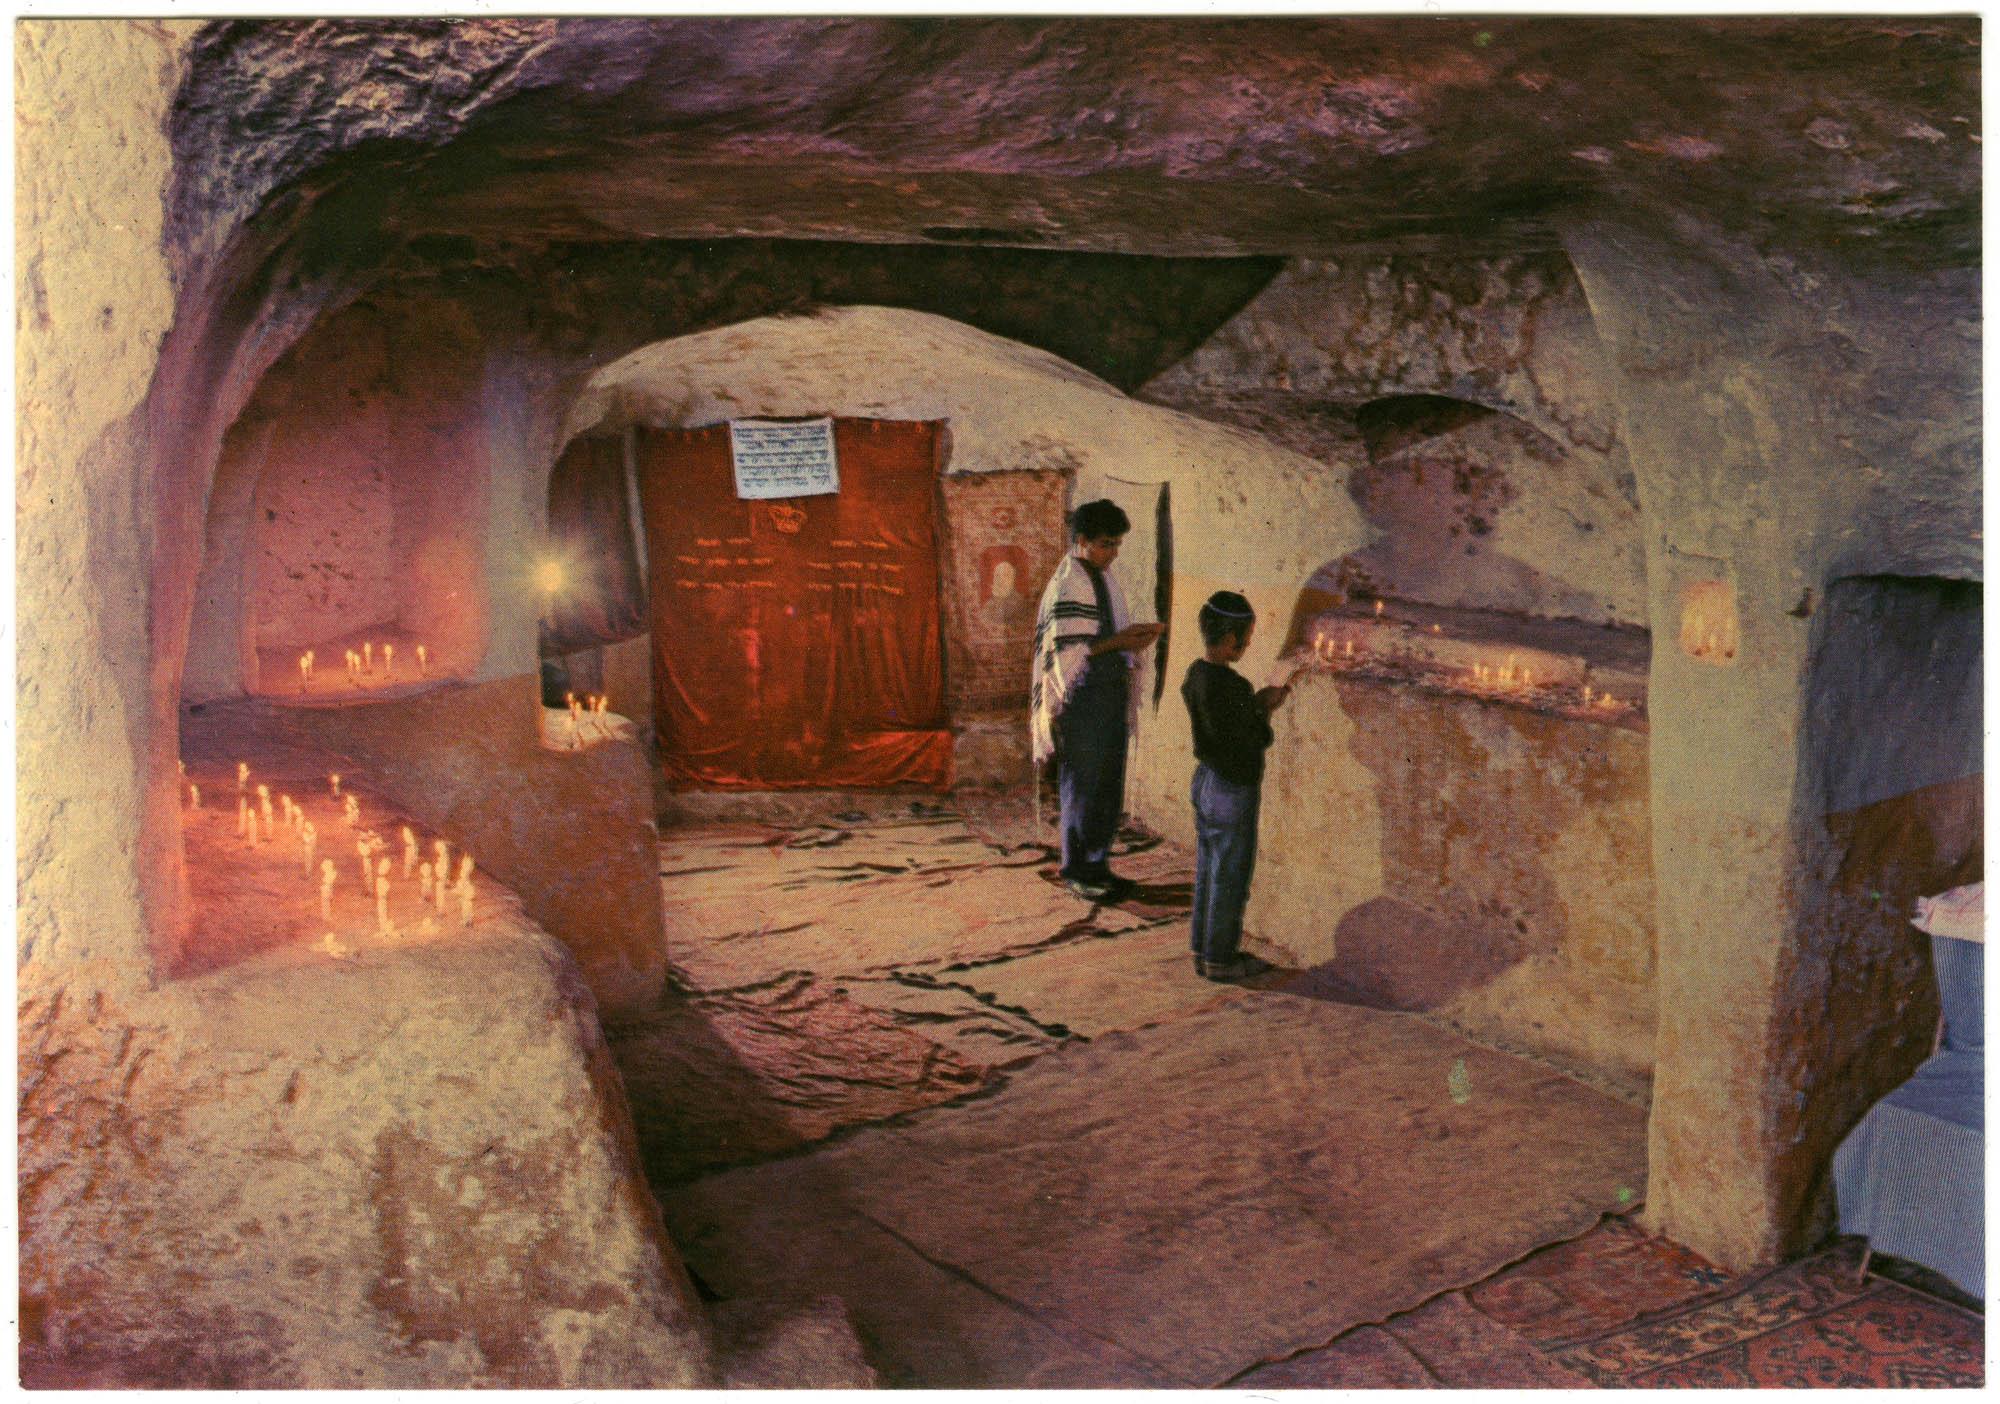 ירושלים, מערת שמעון הצדיק / Jerusalem, the cave of Shimon HaZadik / Jerusalem, le tombeau de Shimon HaZadik